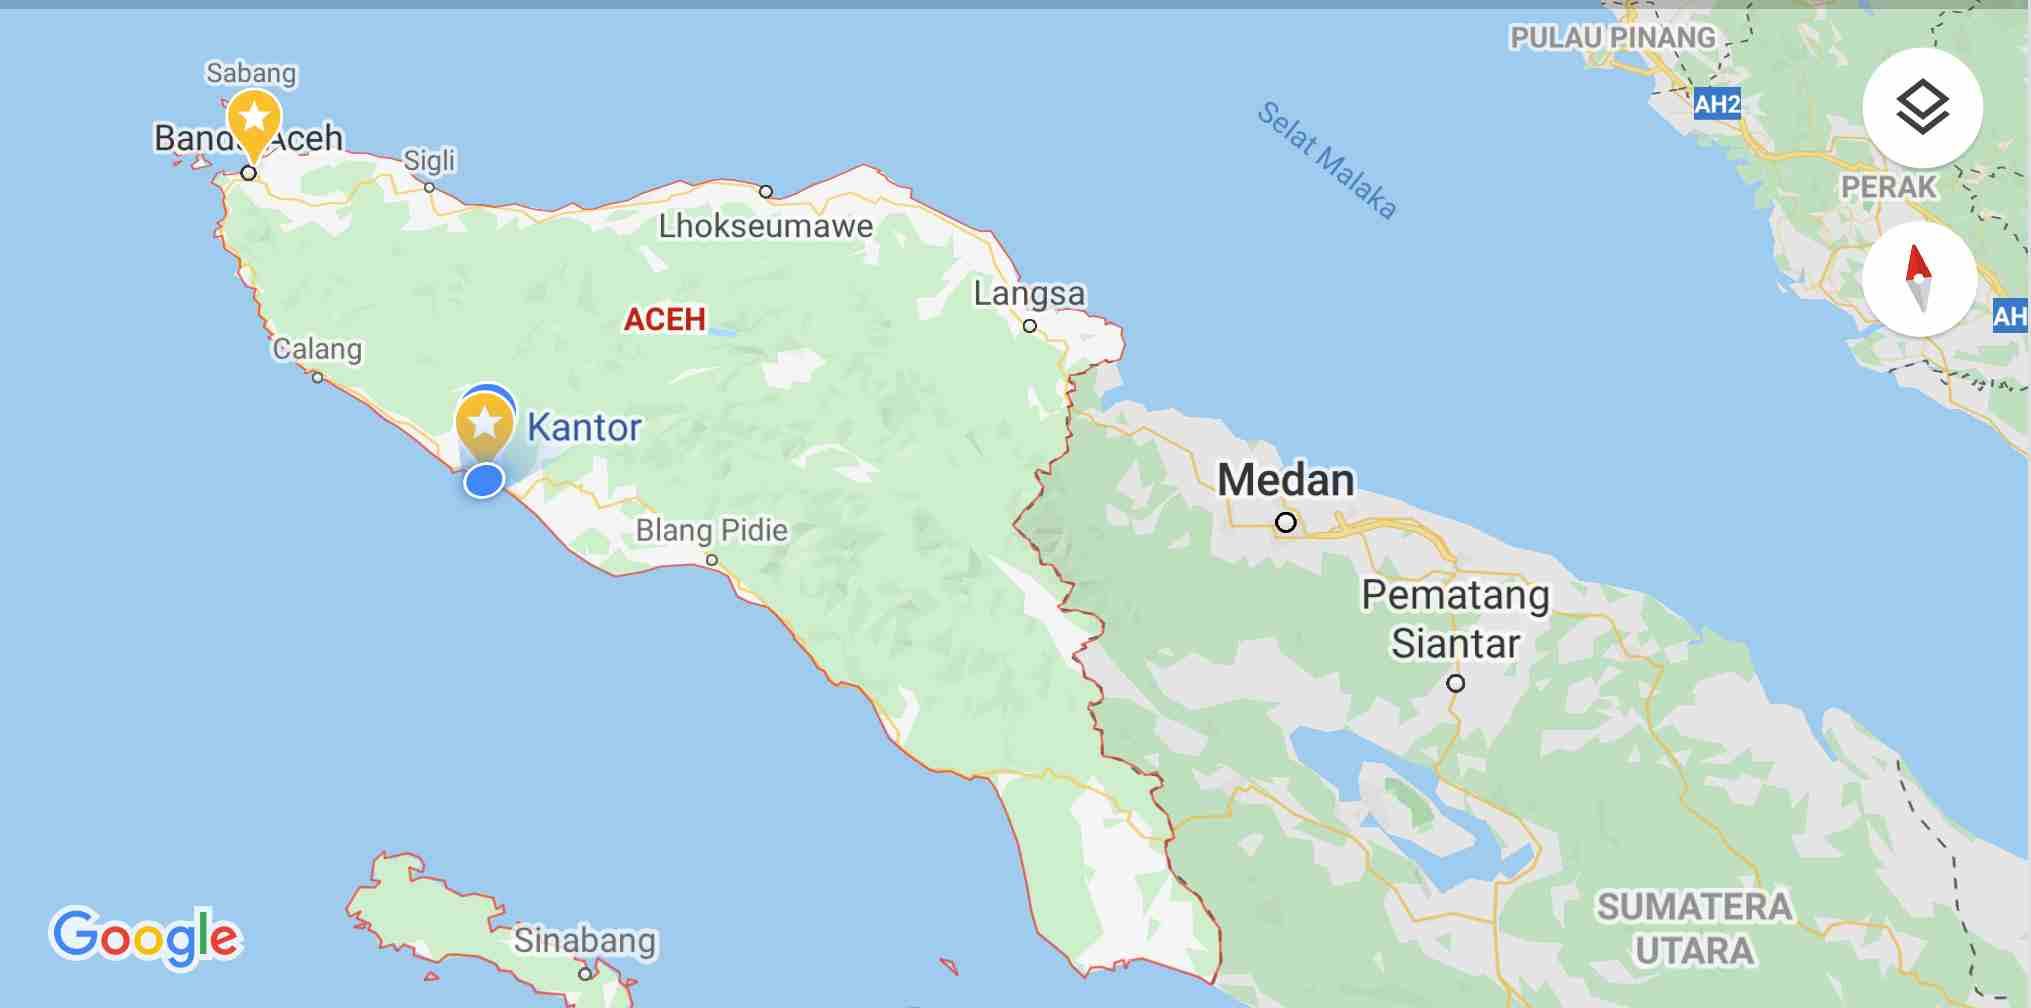 Aceh_map_bnet